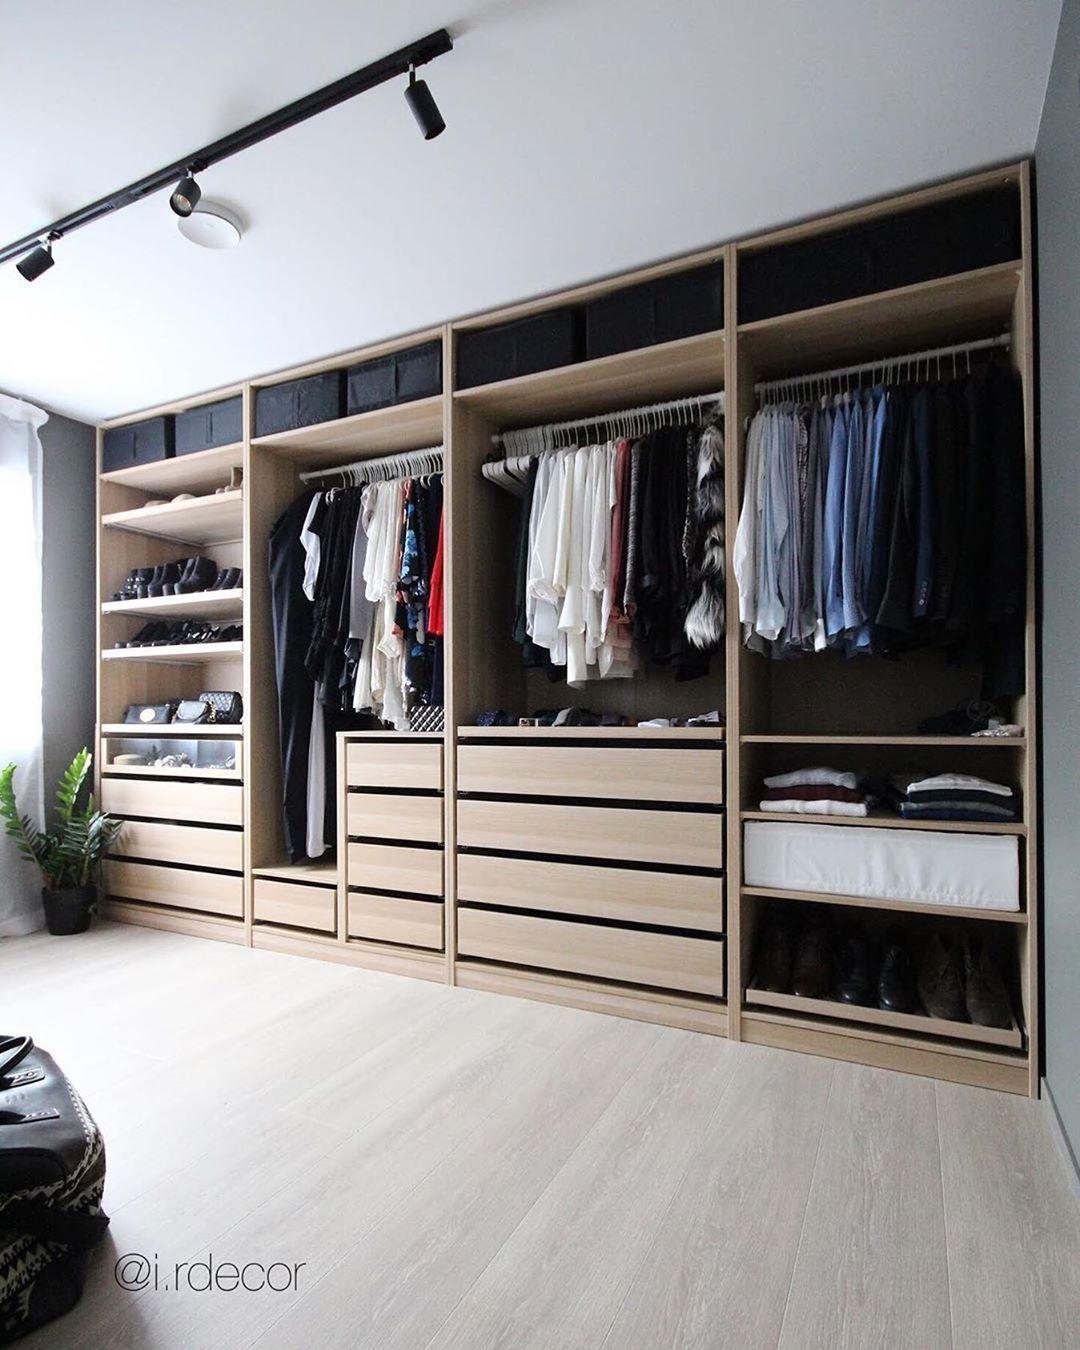 Inspiration For Your Home Home Inspiration Pax In 2020 Aufbewahrung Inneneinrichtung Kleiderschrank Ideen